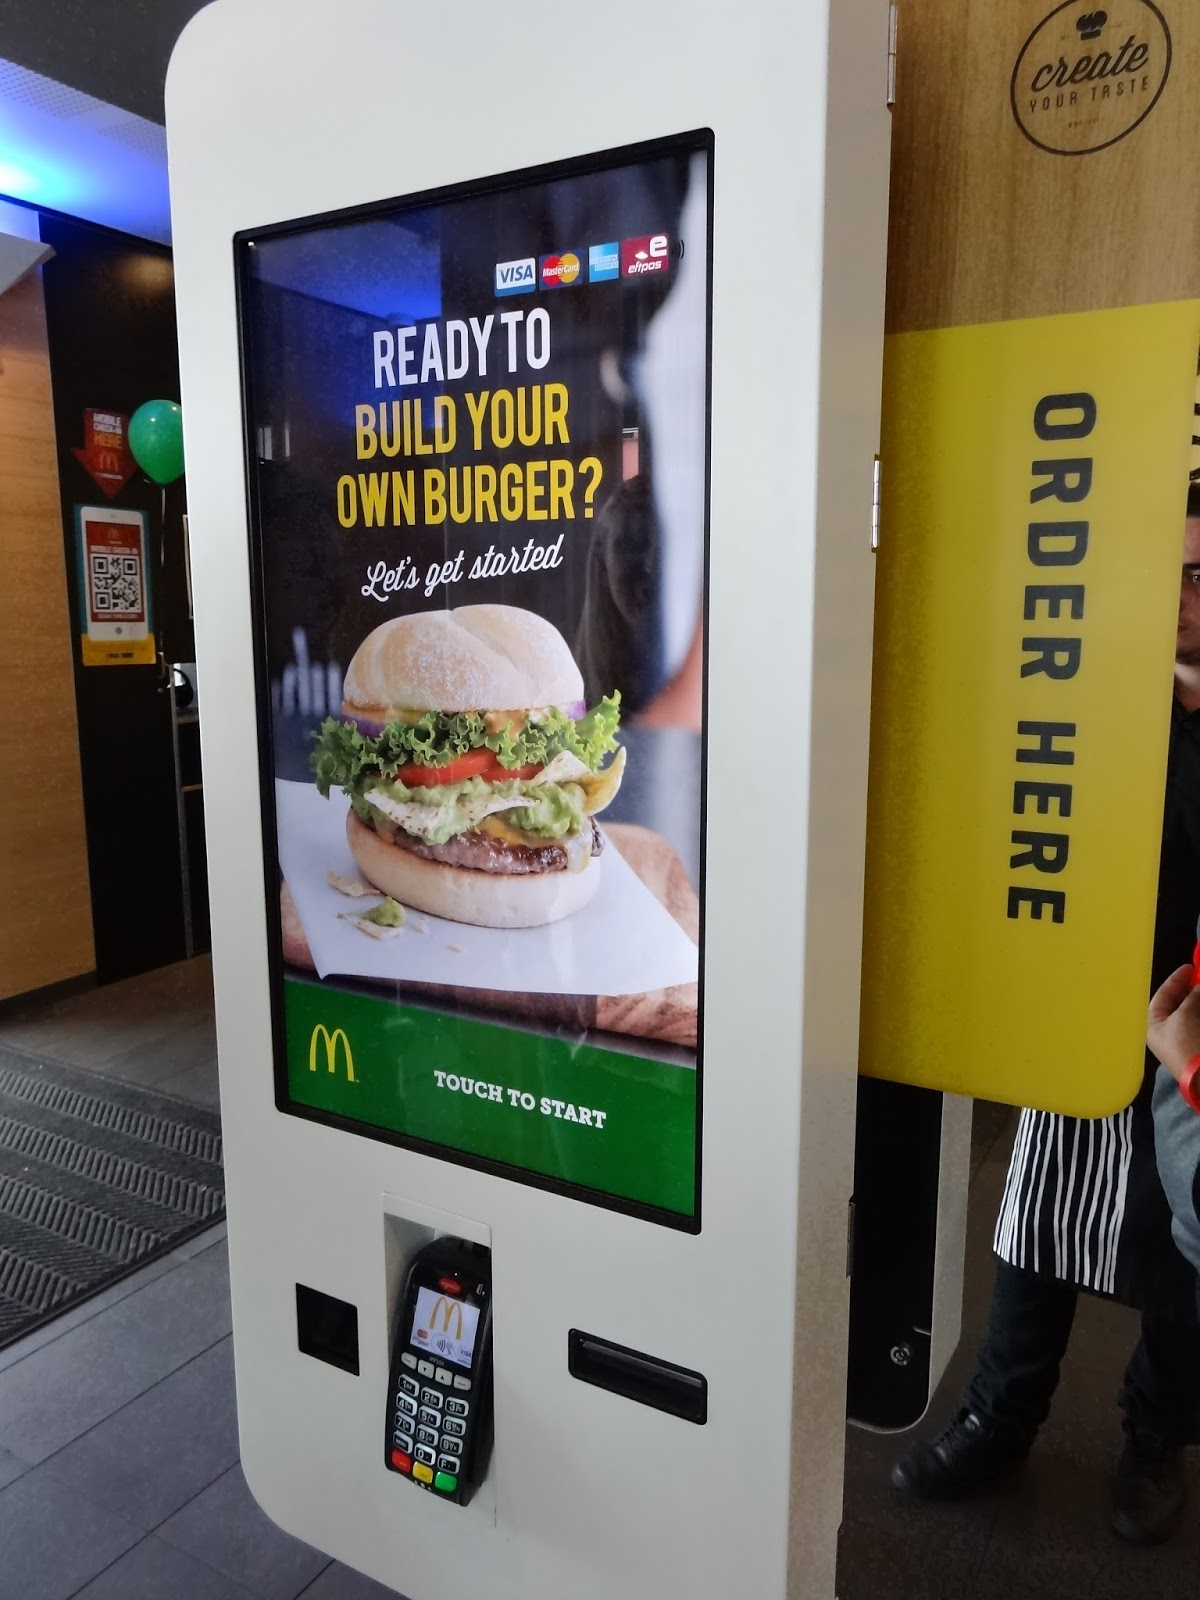 mcdonalds, create your taste, adelaide, food, port adelaide, fries, burgers, custom, digital kiosk, order